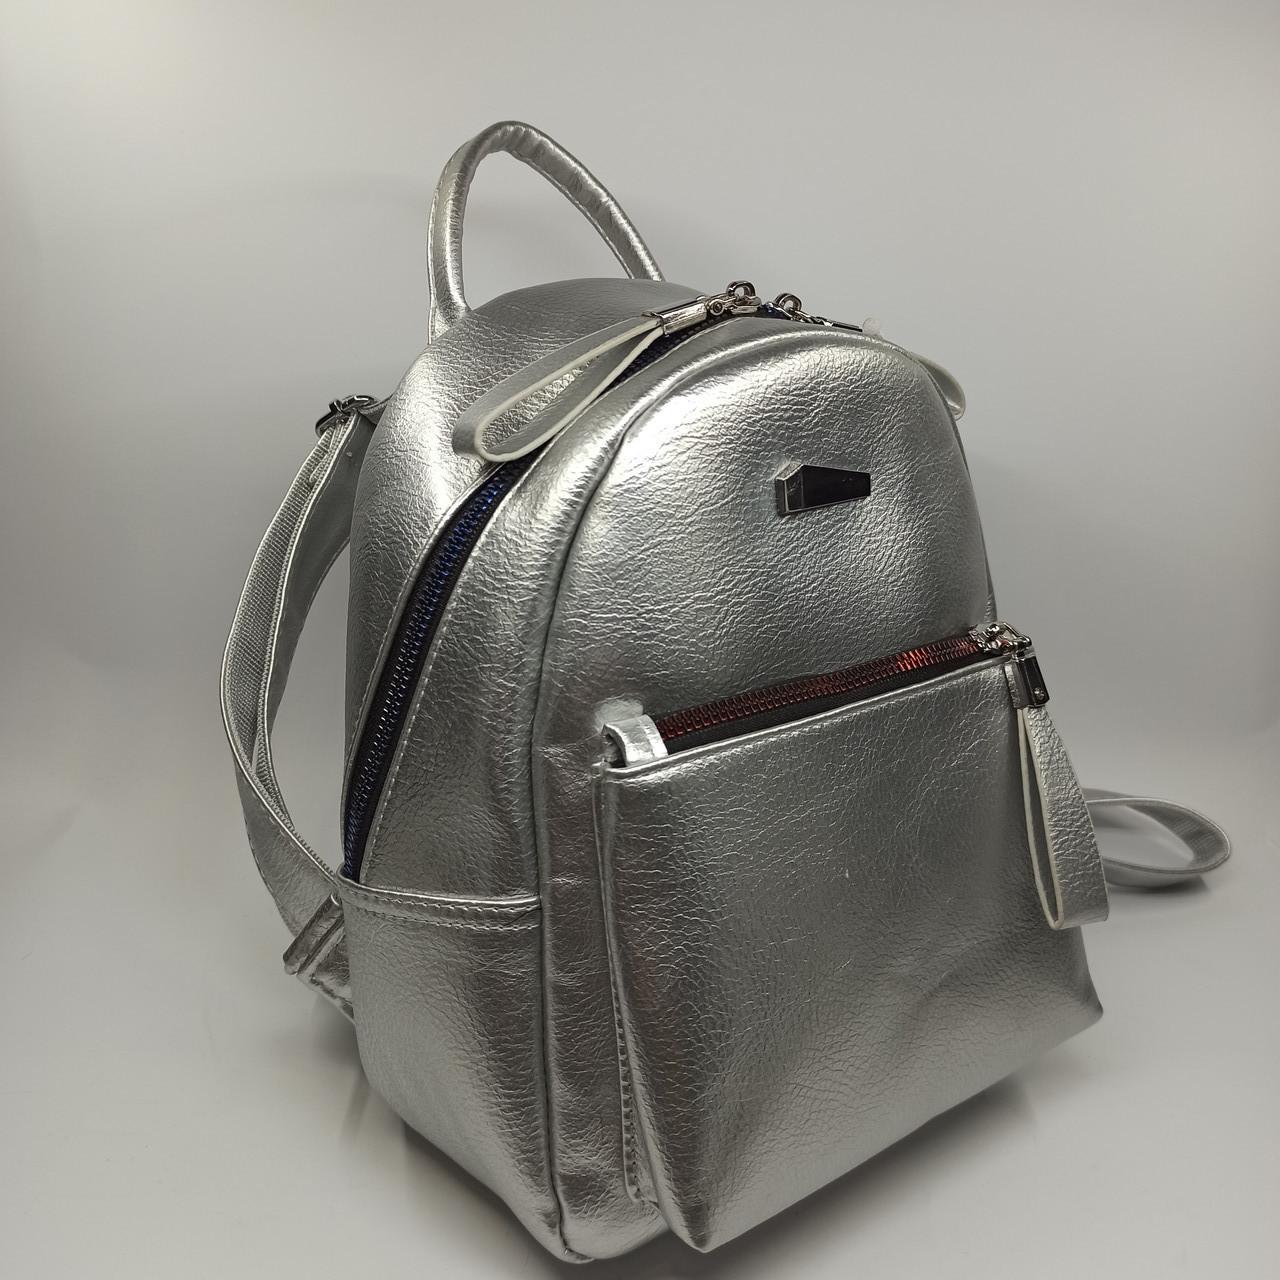 Жіночий рюкзак / Женский рюкзак